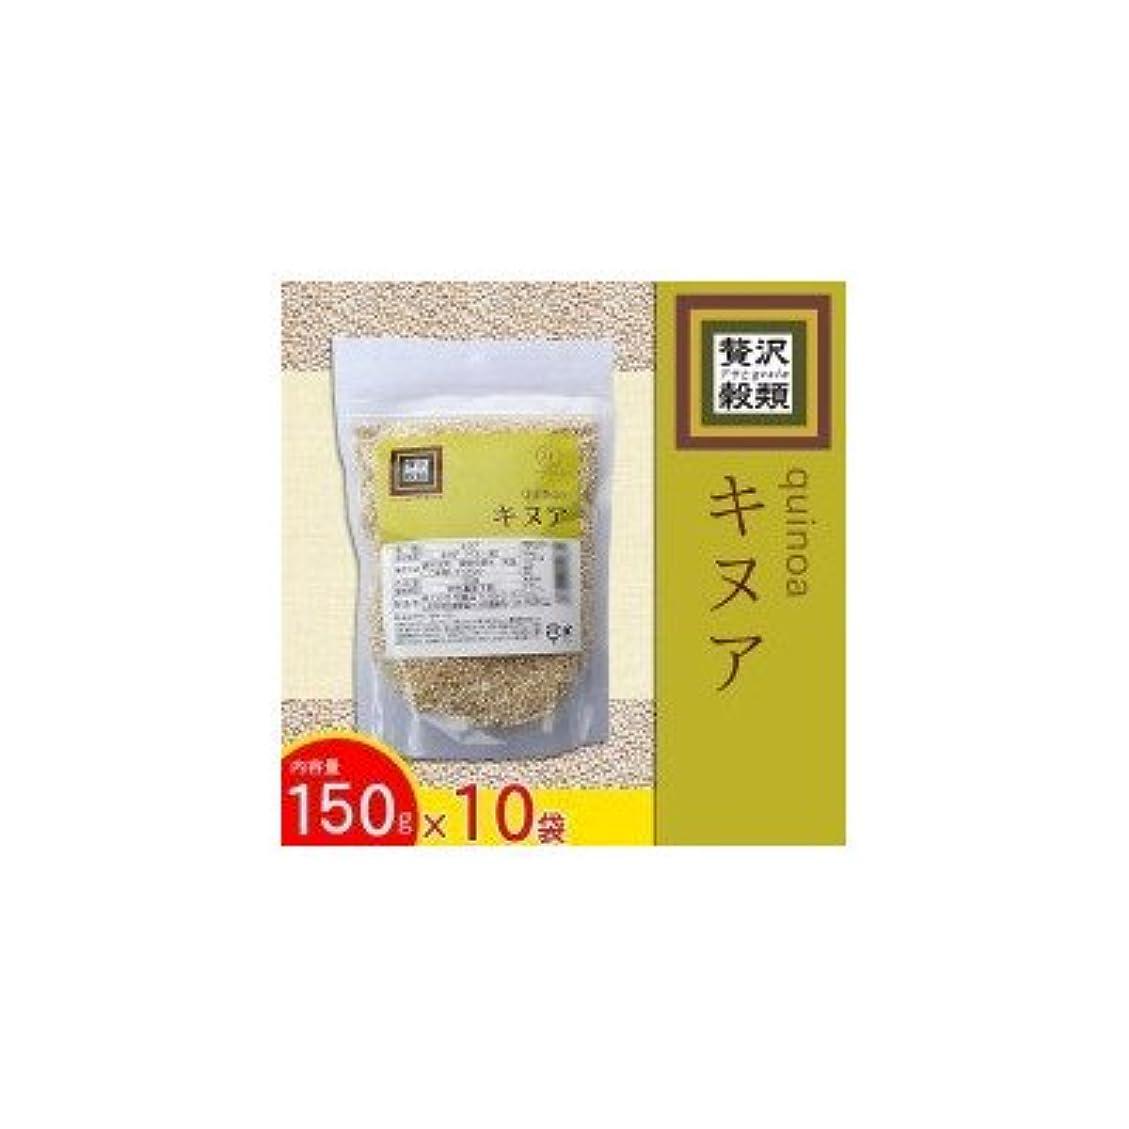 準拠図接尾辞贅沢穀類 キヌア 150g×10袋